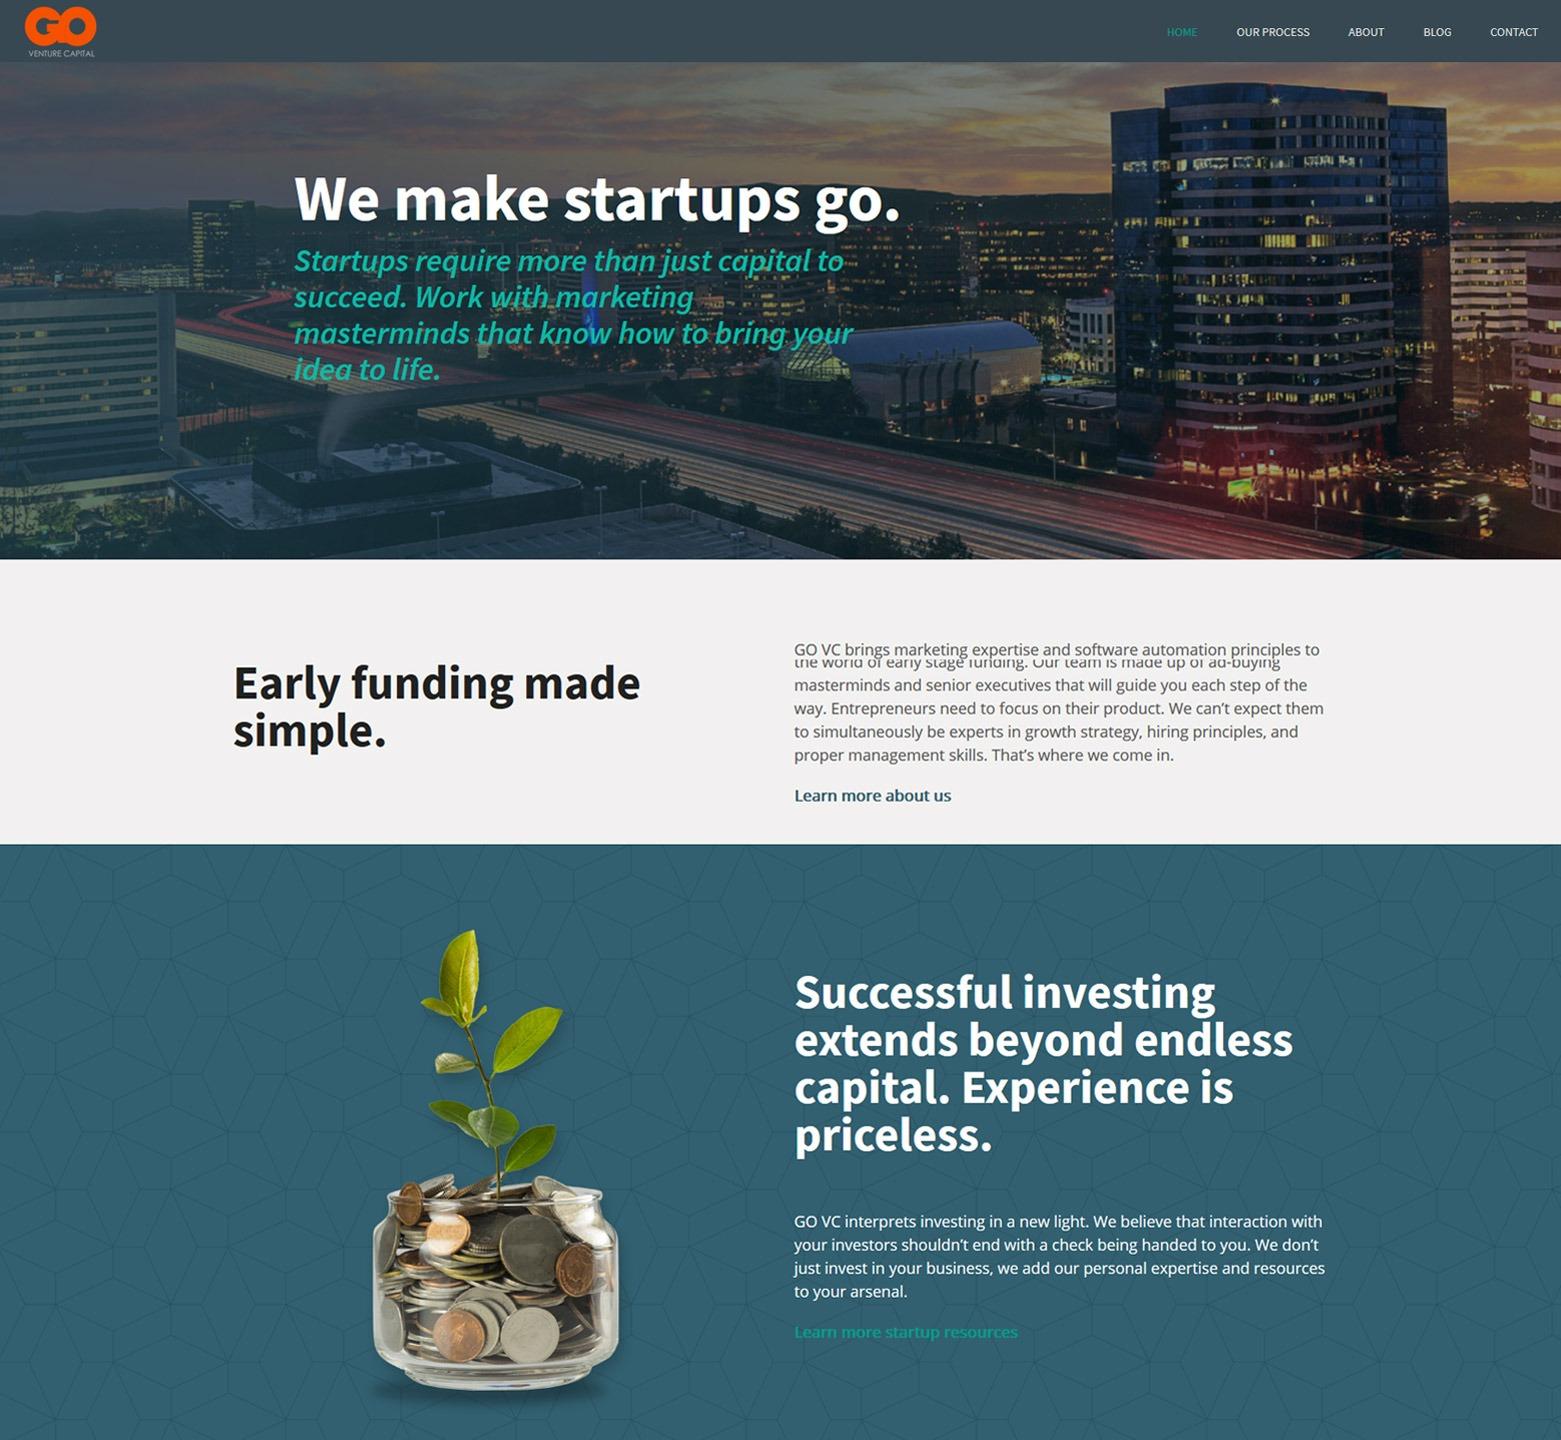 Los Angeles Venture Capital Web Design Company